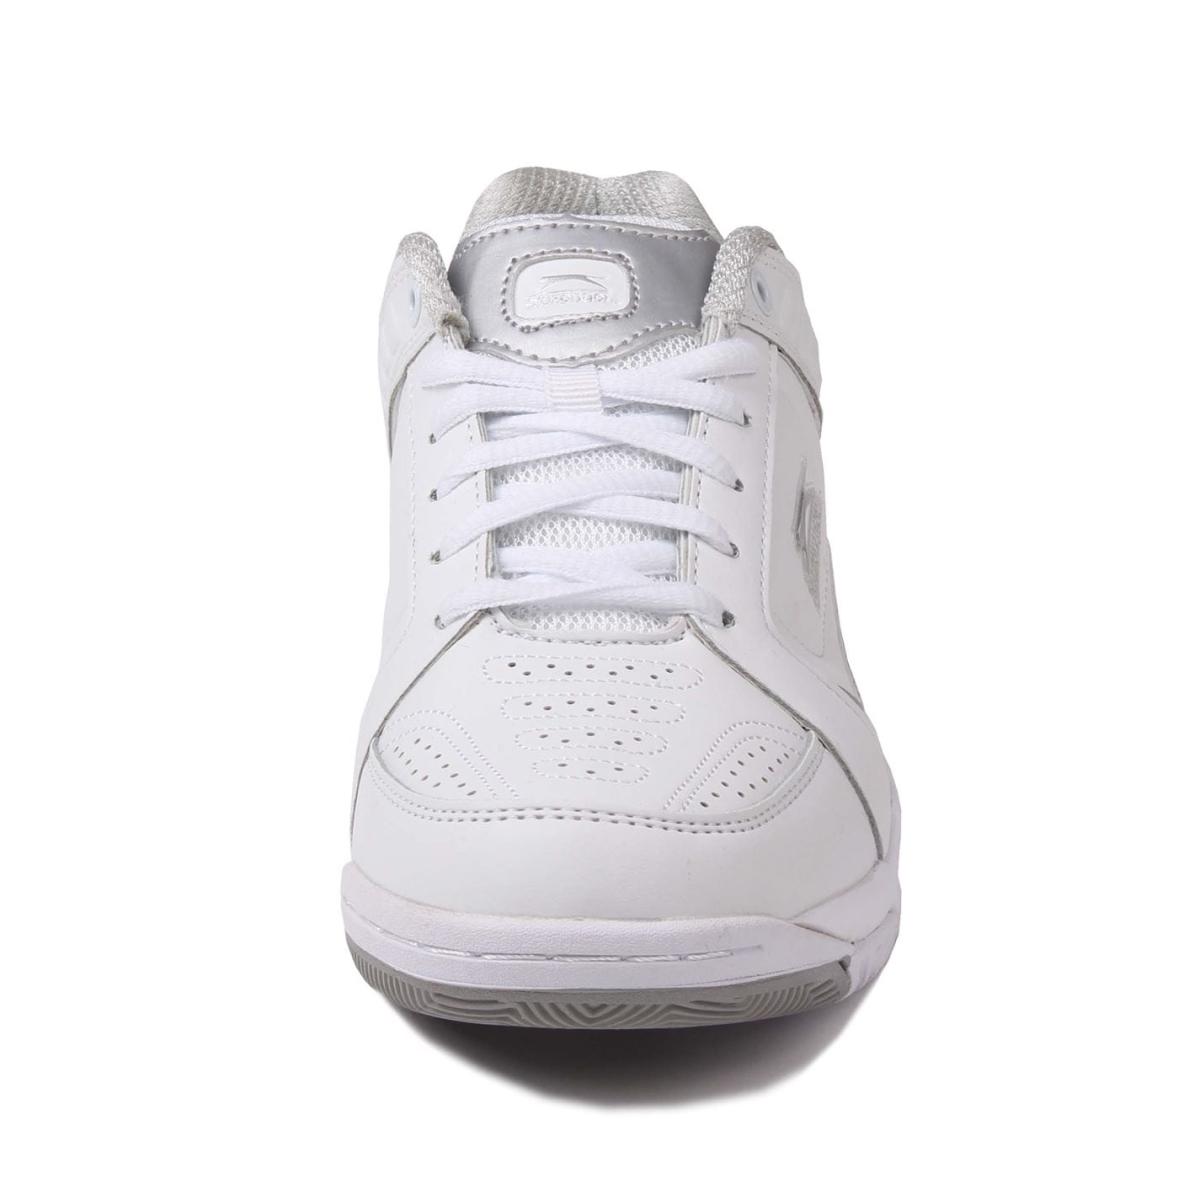 Slazenger-Turnschuhe-Laufschuhe-Damen-Sportschuhe-Sneakers-Lifestyle-6118 Indexbild 6